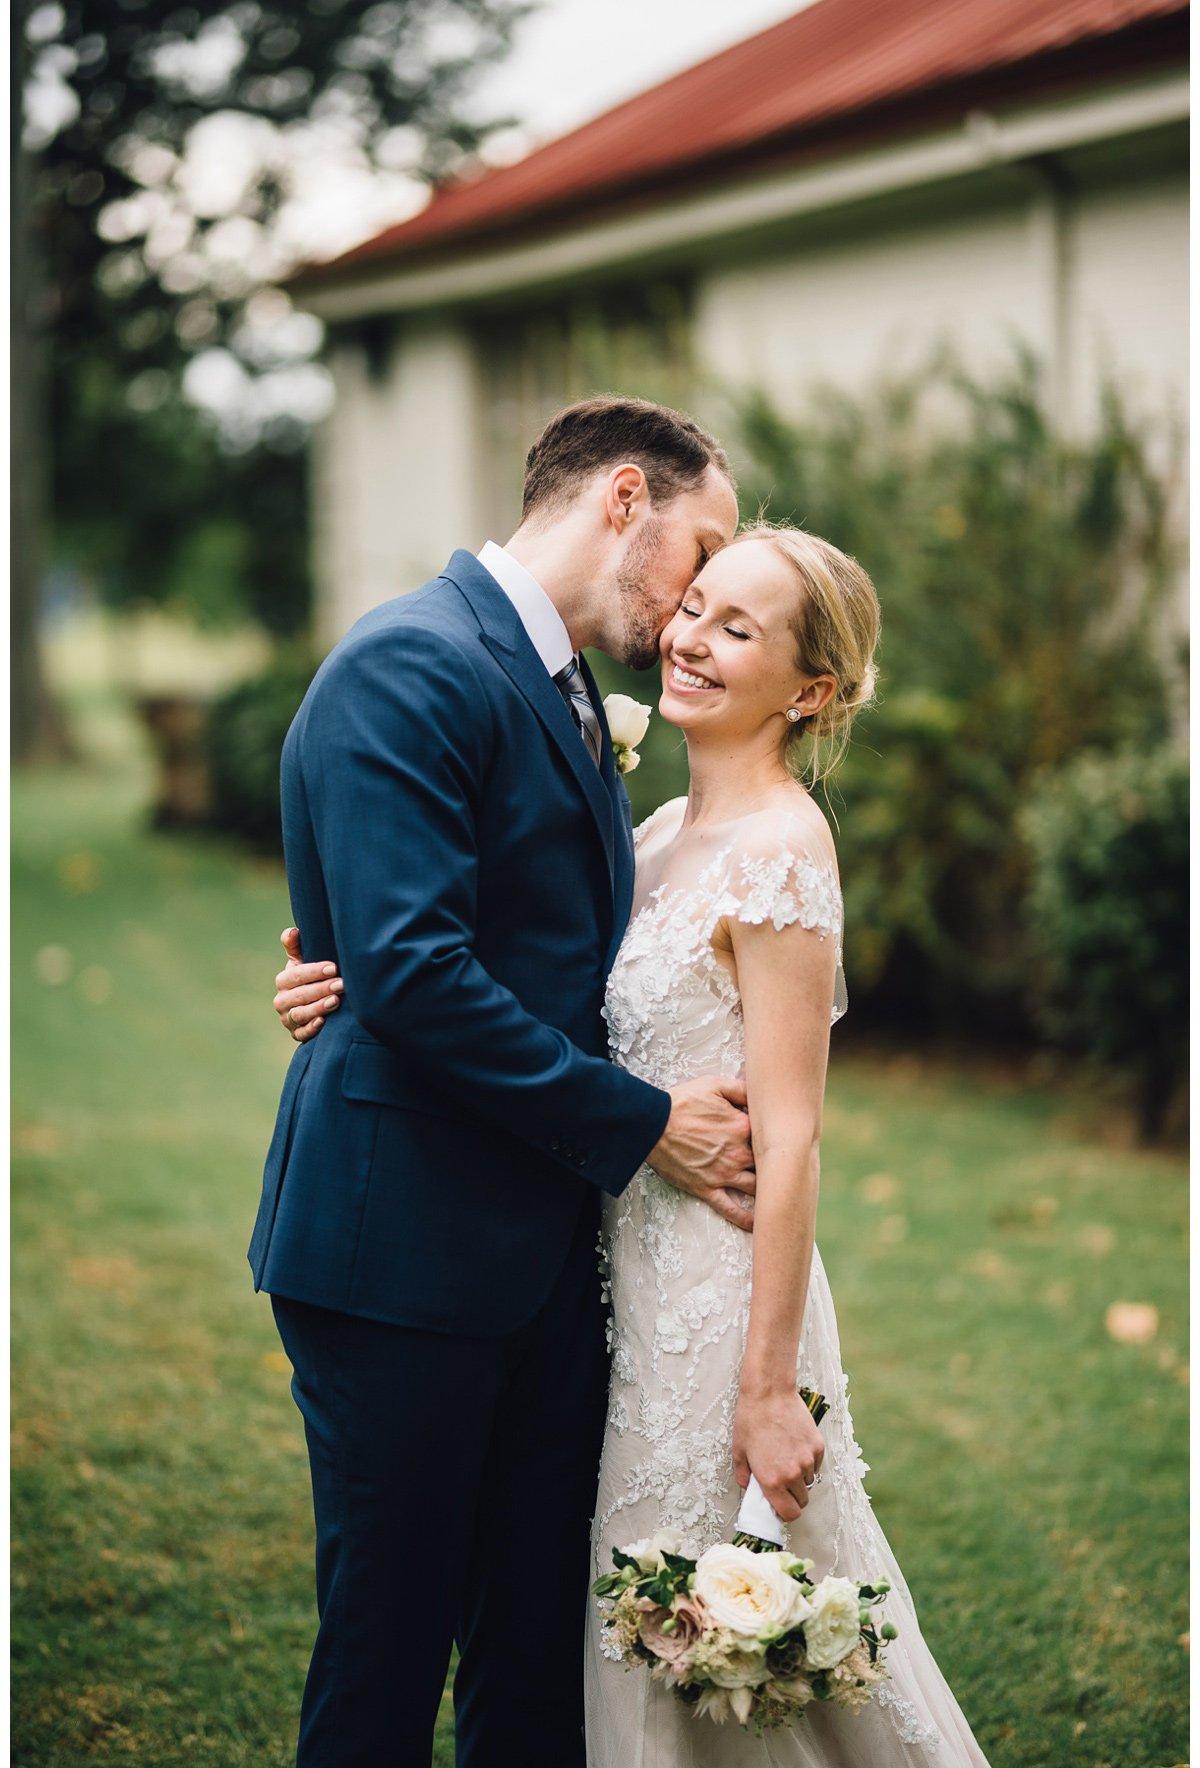 kiss-on-cheek-3 Clementine Hall   Nashville Wedding   Rachel and Bobby